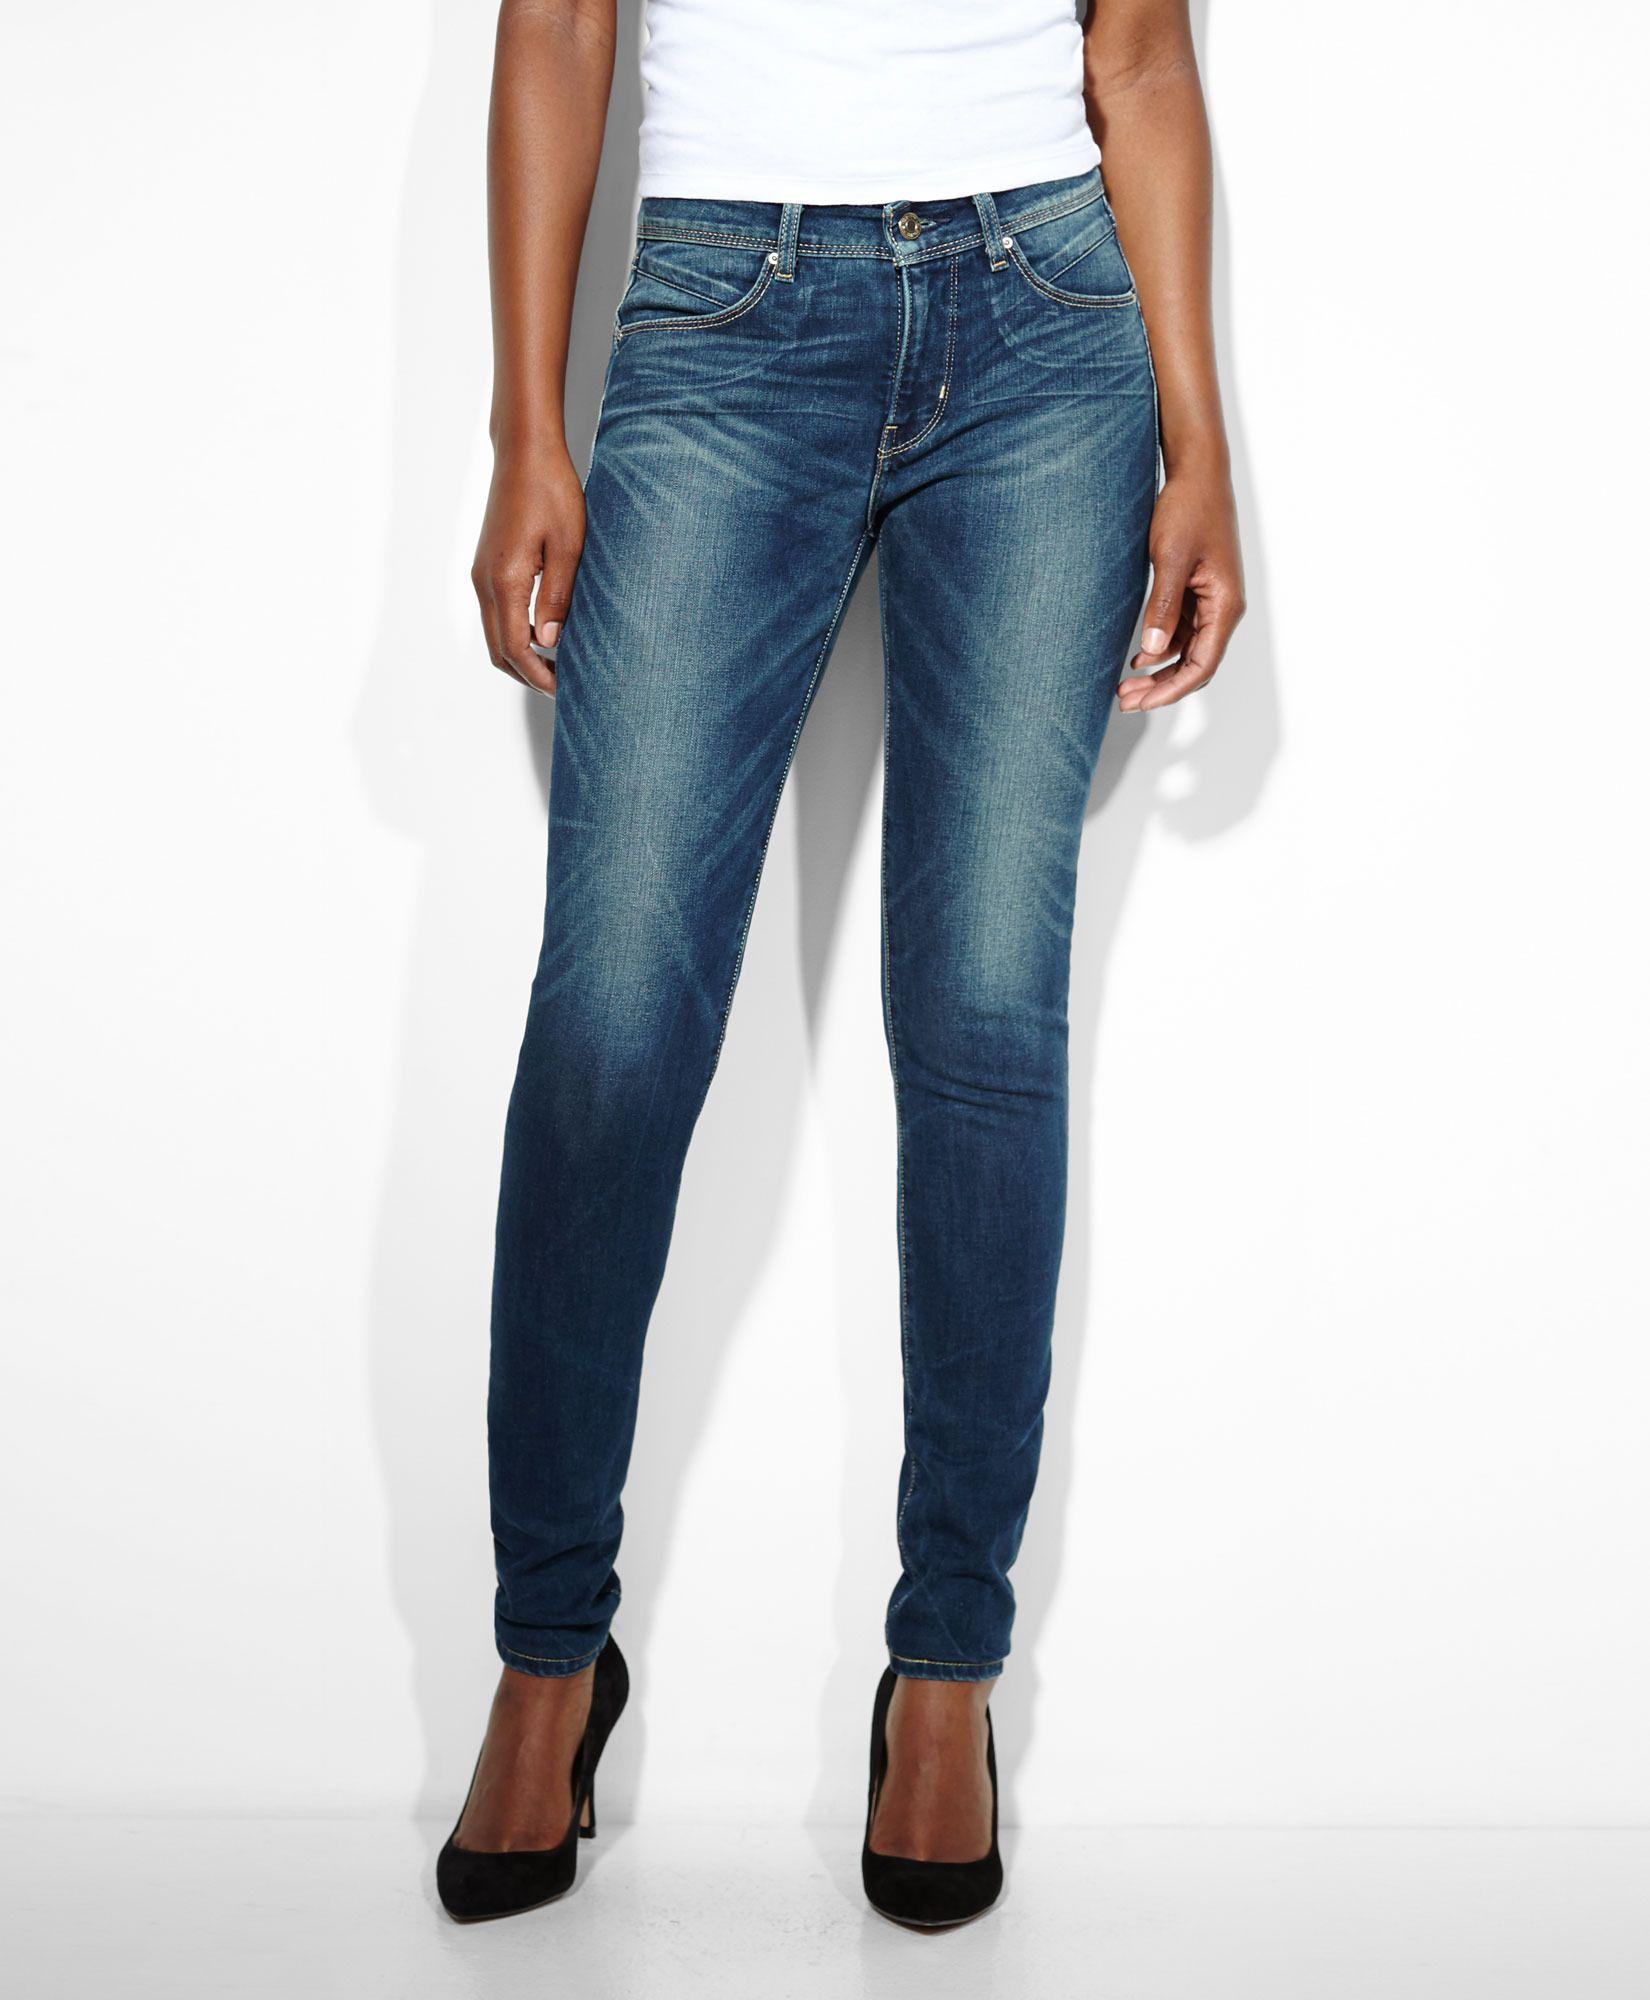 Levi's Revel Slight Curve Skinny Jeans - High Low - Slight Curve